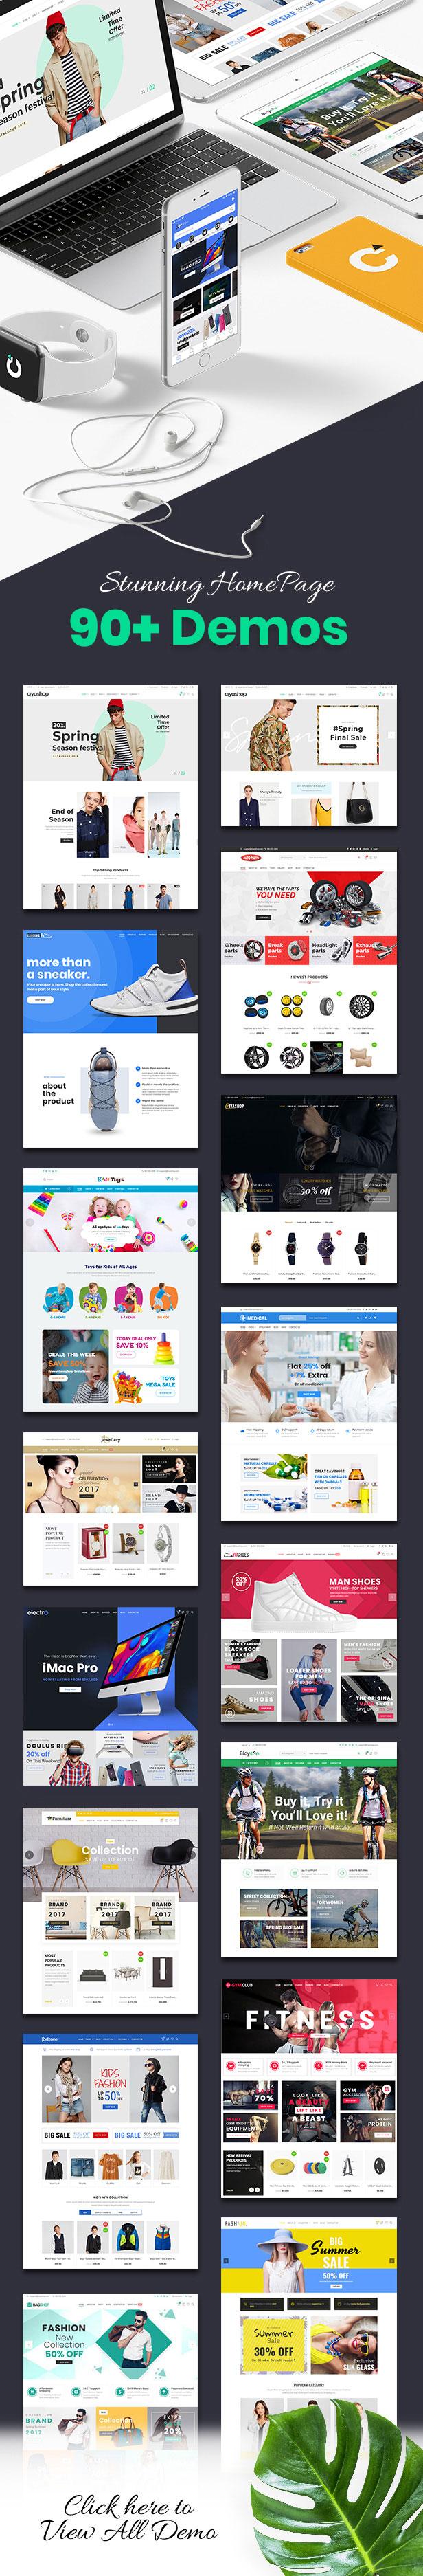 CiyaShop - Responsive Multi-Purpose WooCommerce WordPress Theme - 3